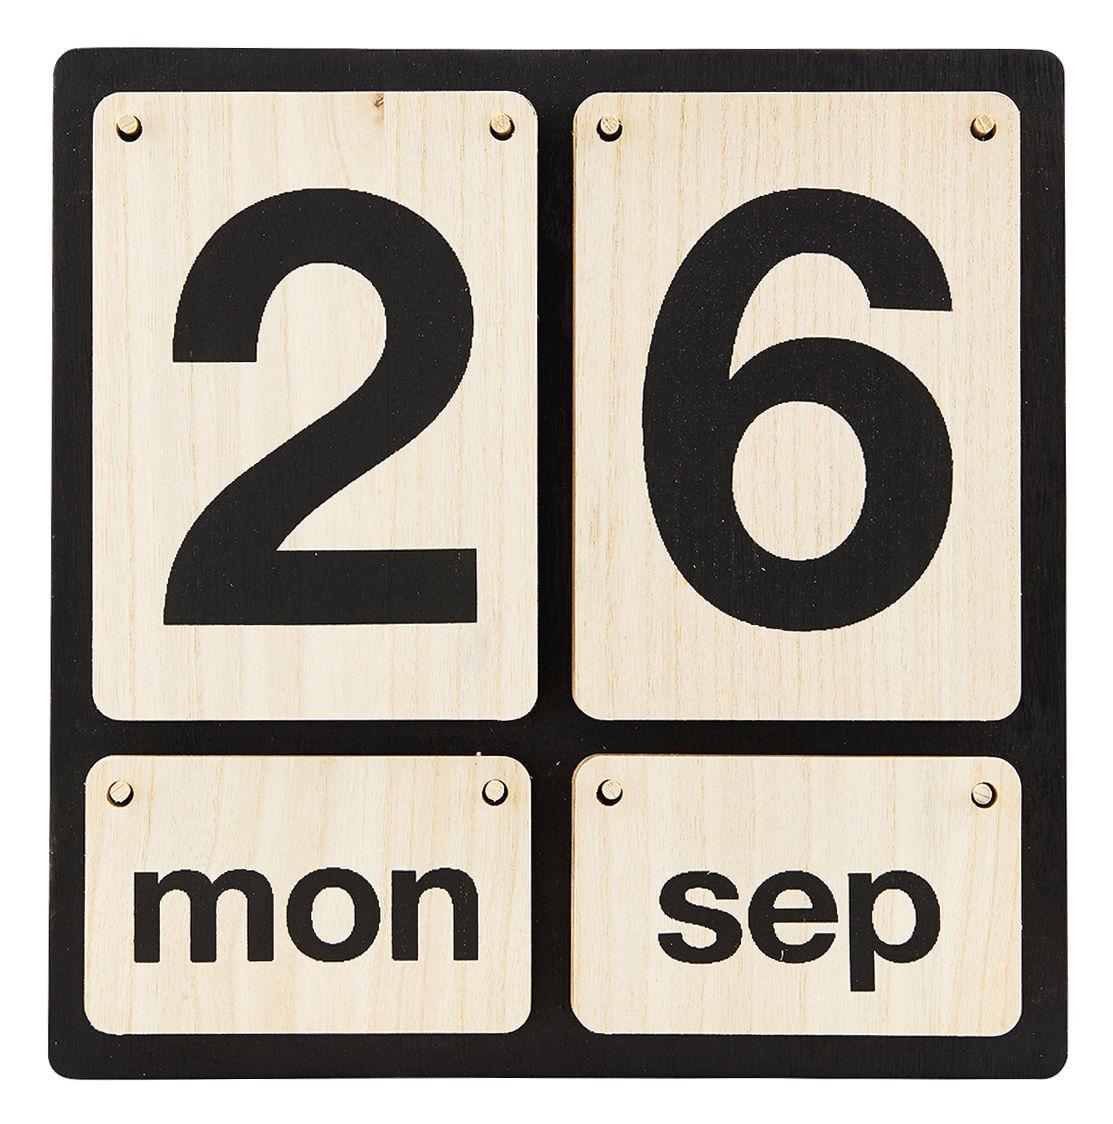 lightyear ewiger kalender zum aufh ngen holz helles. Black Bedroom Furniture Sets. Home Design Ideas